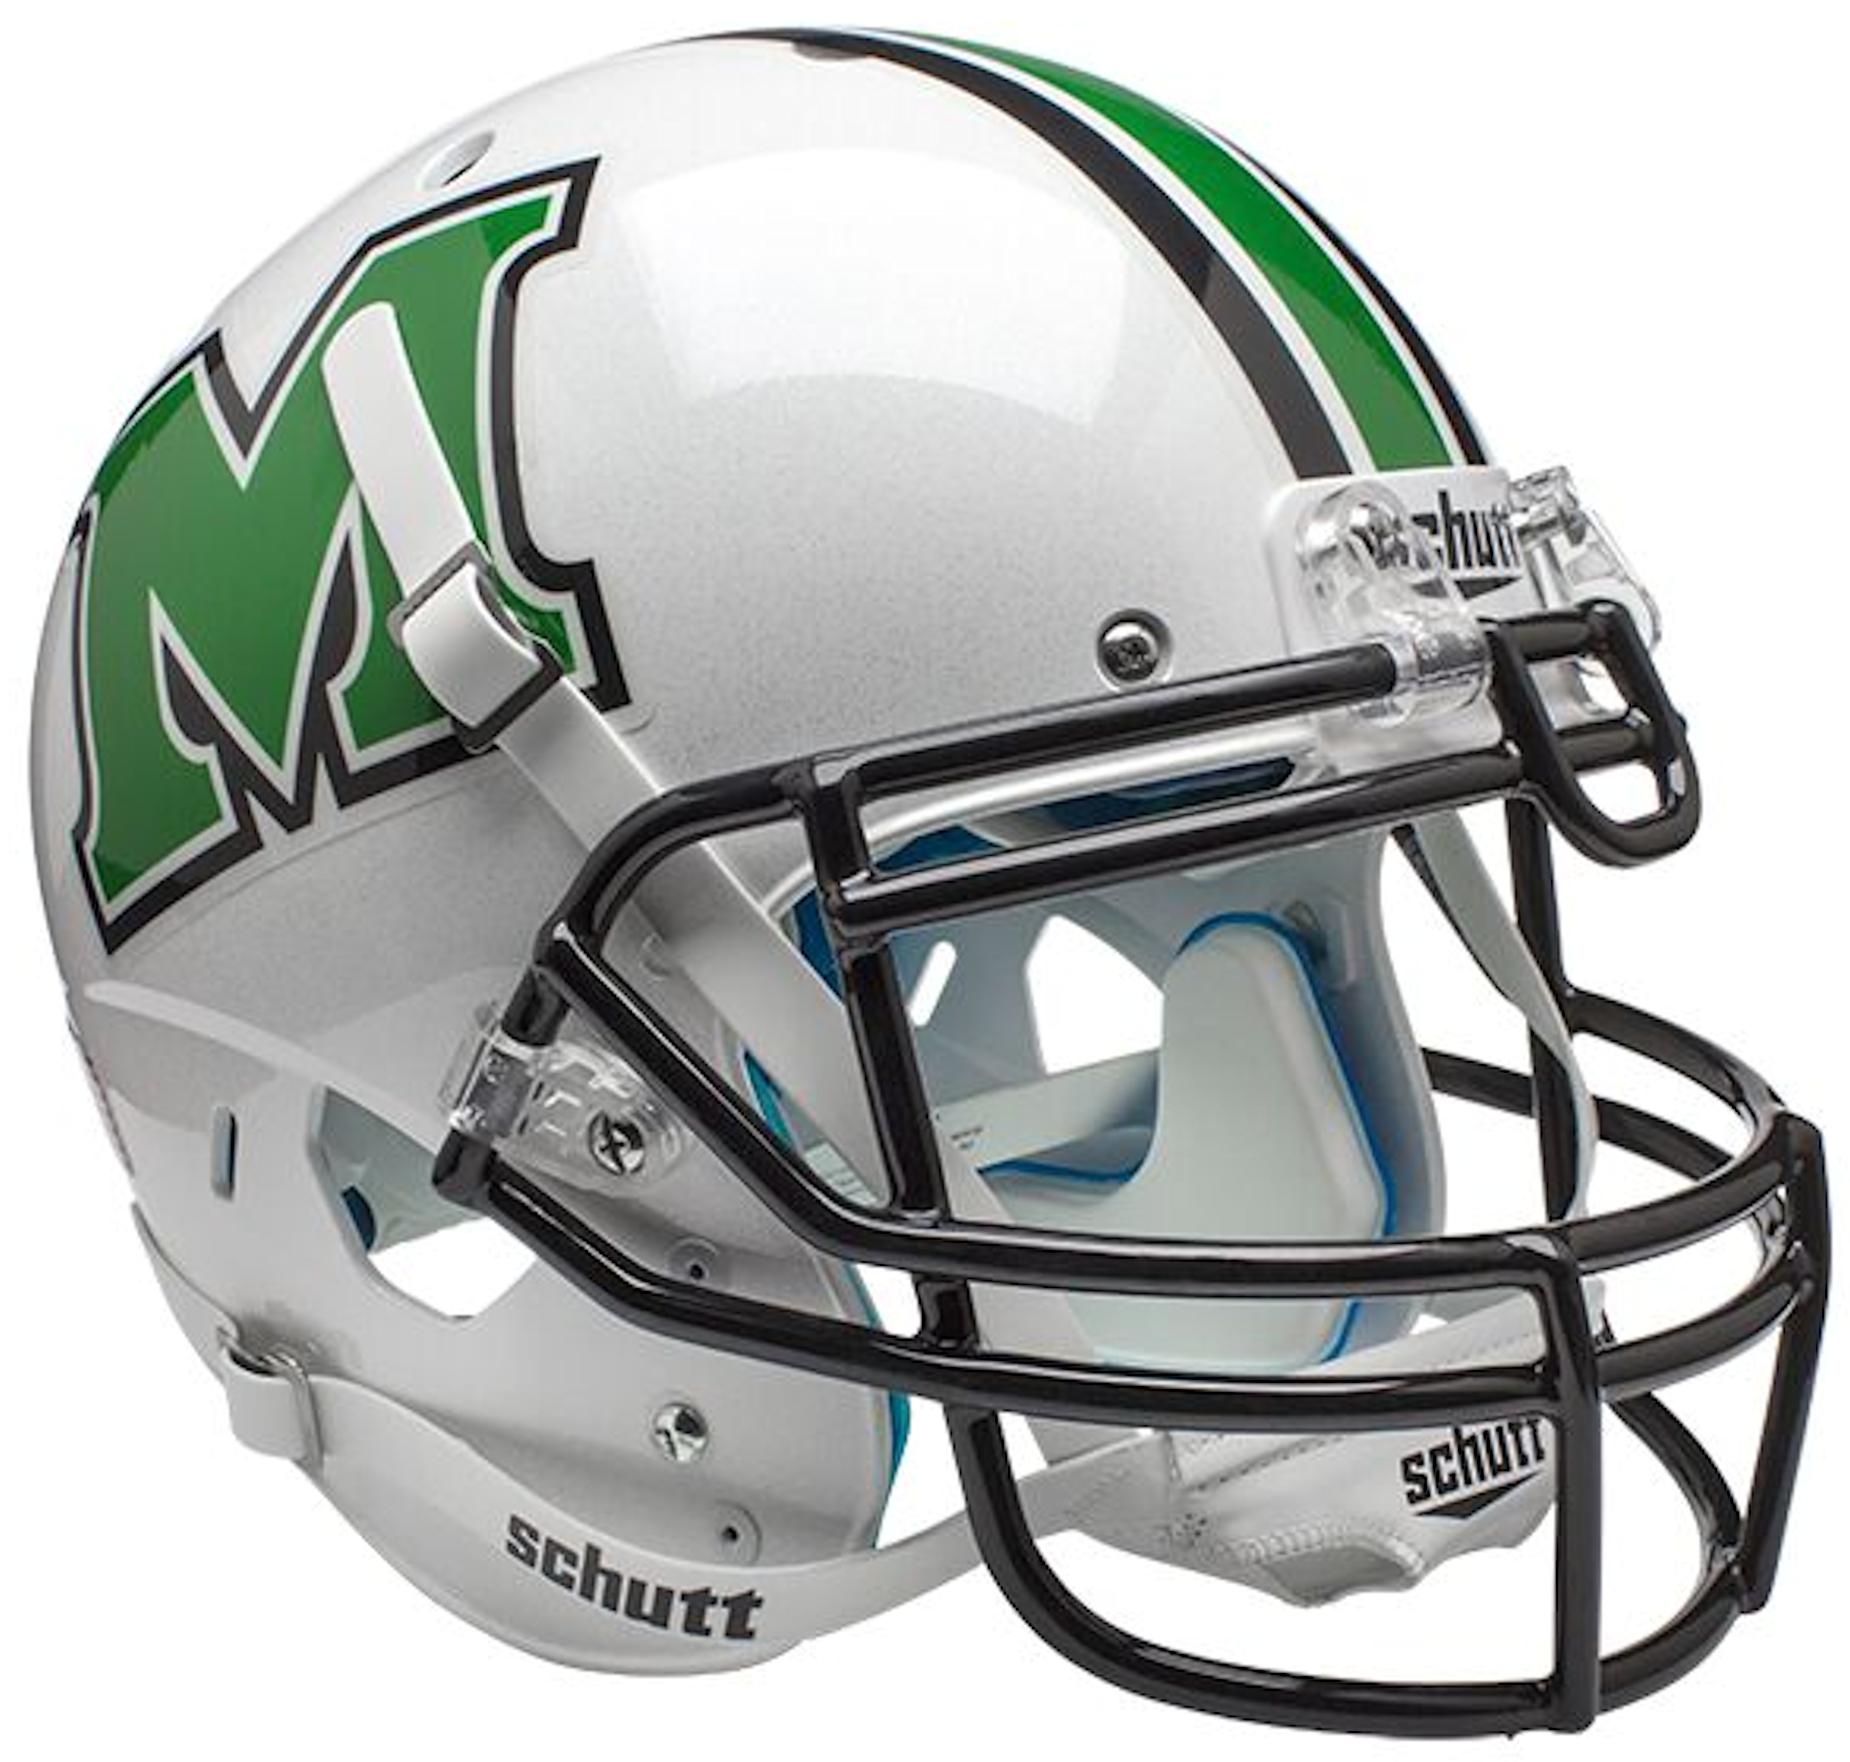 Marshall Thundering Herd Authentic College XP Football Helmet Schutt